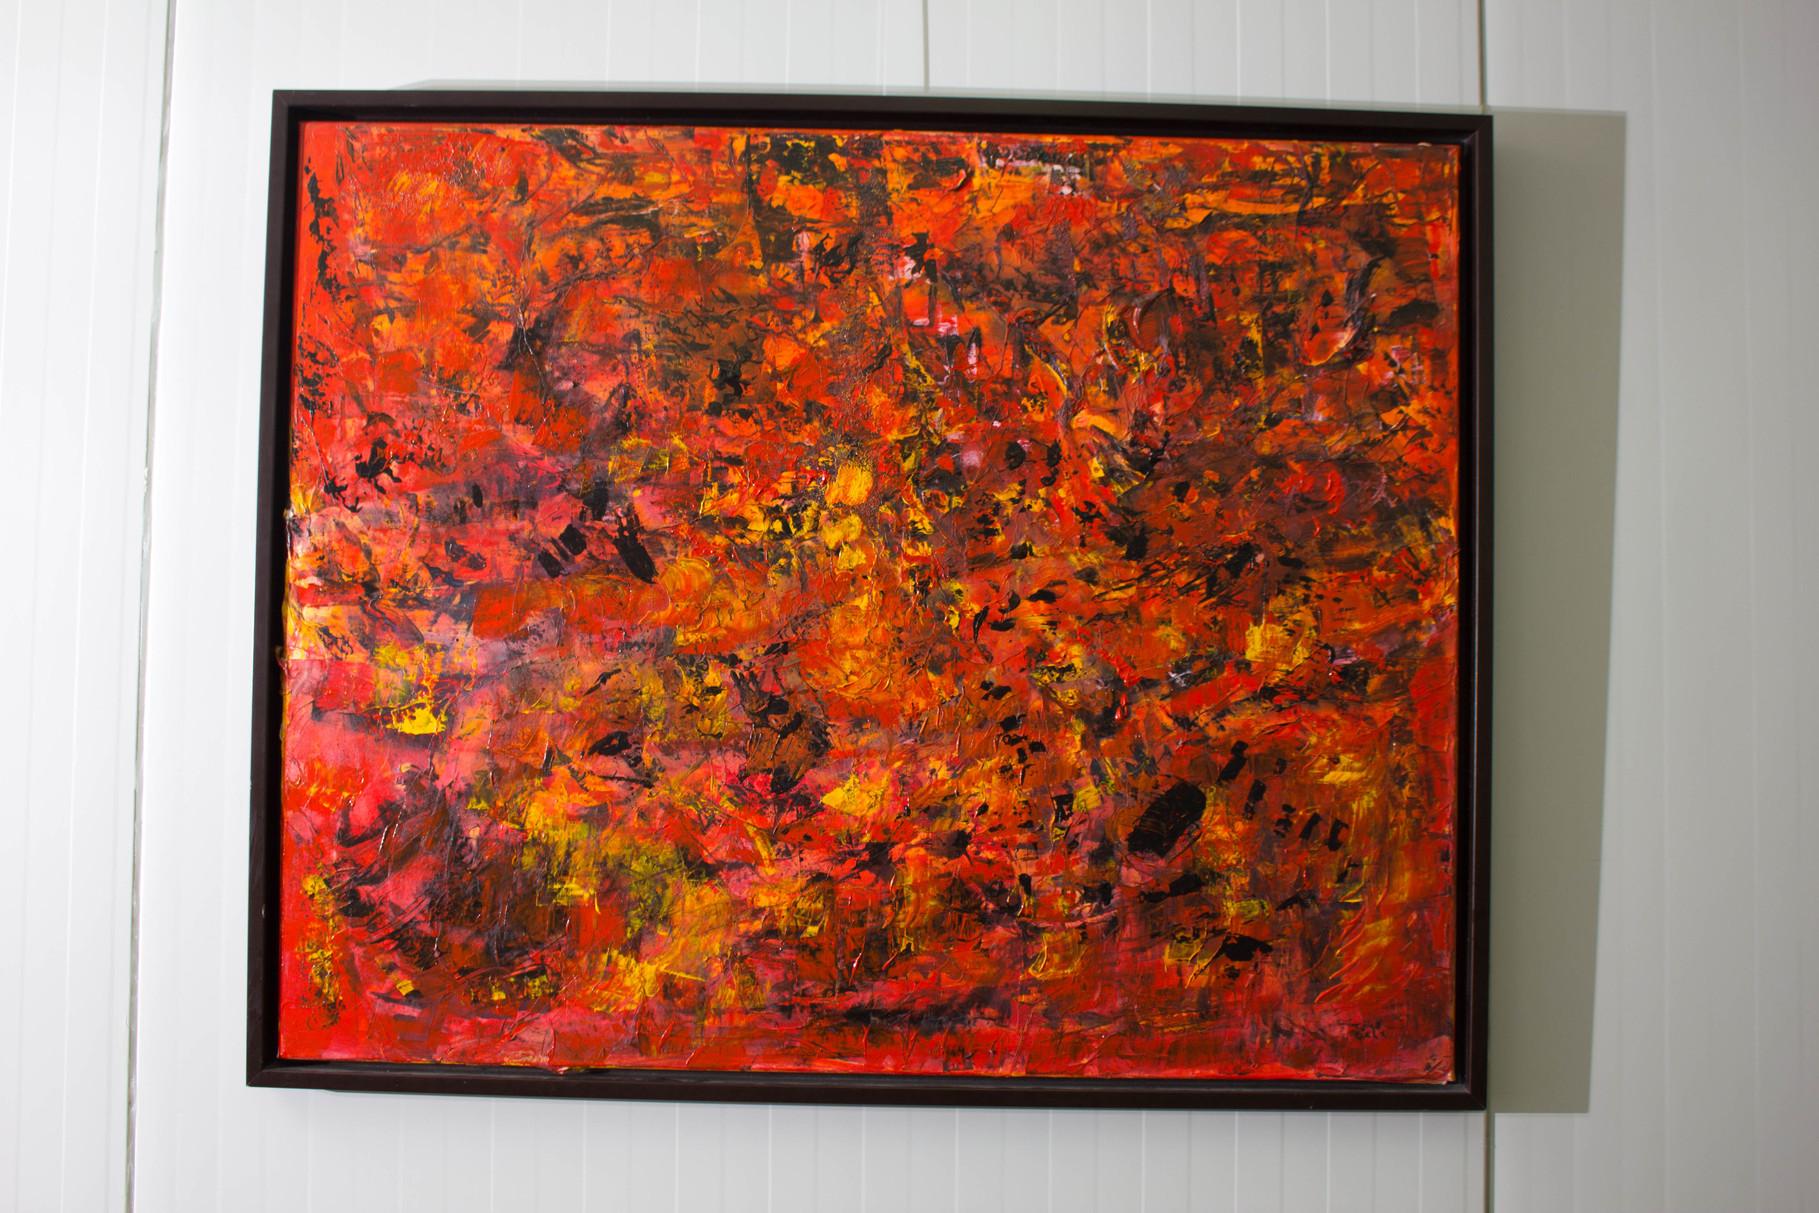 Nr. 35 Dietmar Krause,  Acryl auf Japanpapier auf Leinwand, 100 x 120cm